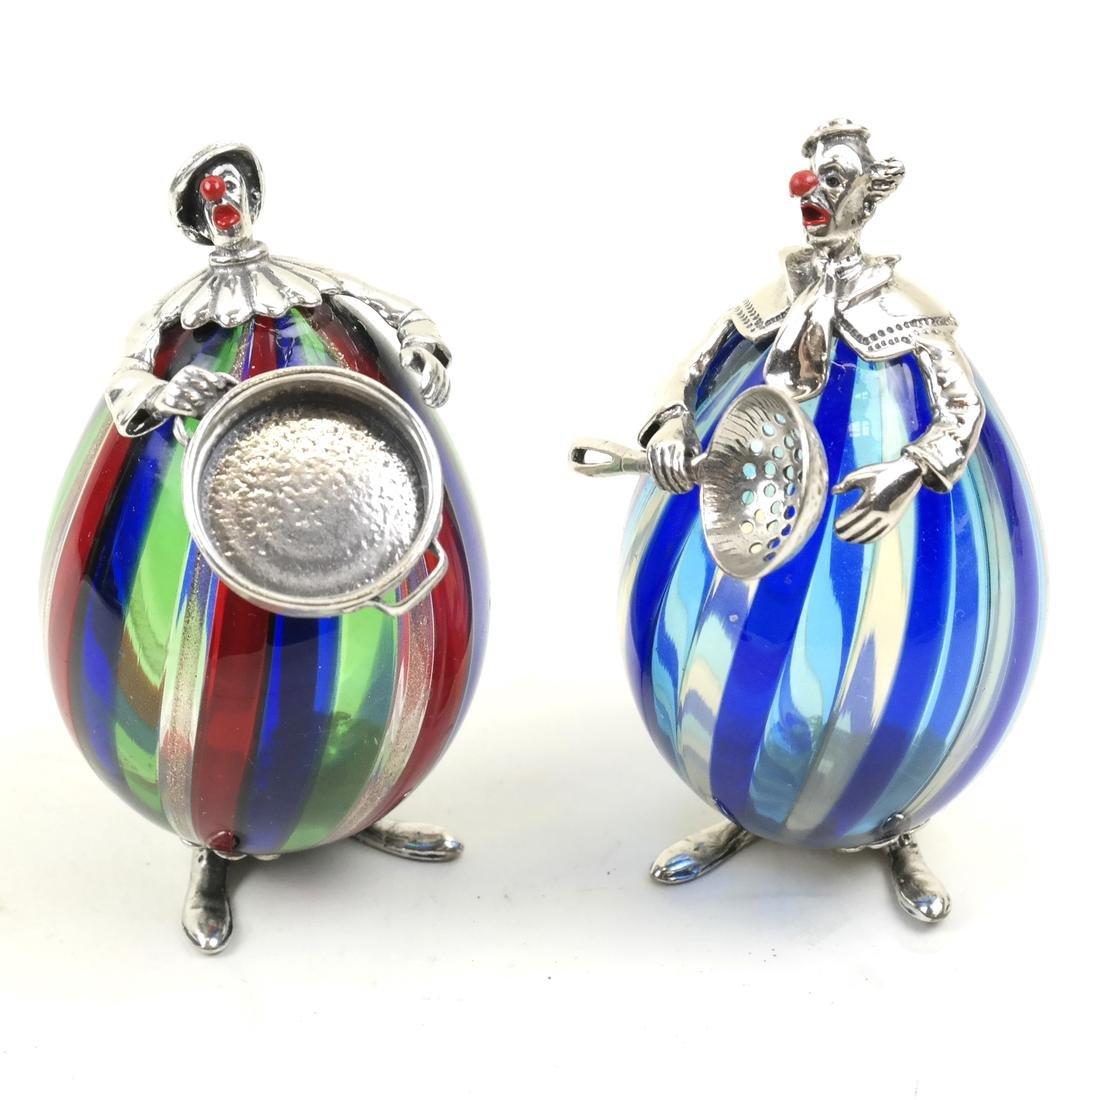 Two Venini Glass & Silver Sculptures